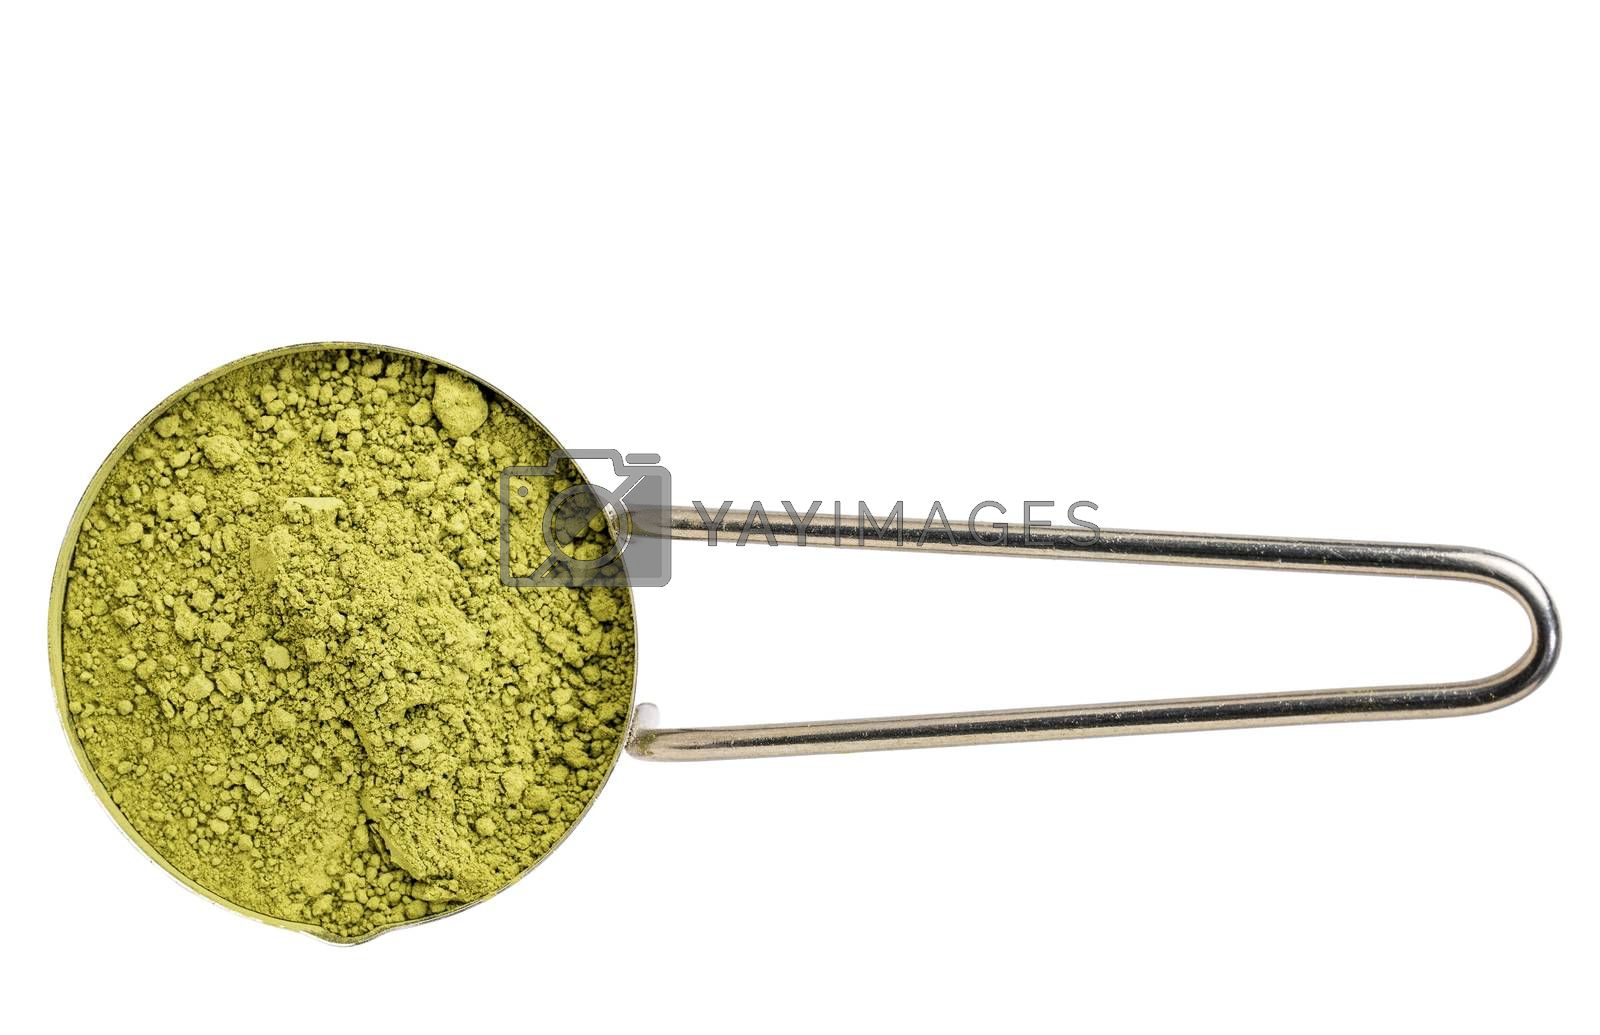 measuring scoop of organic matcha green tea powder isolated on white